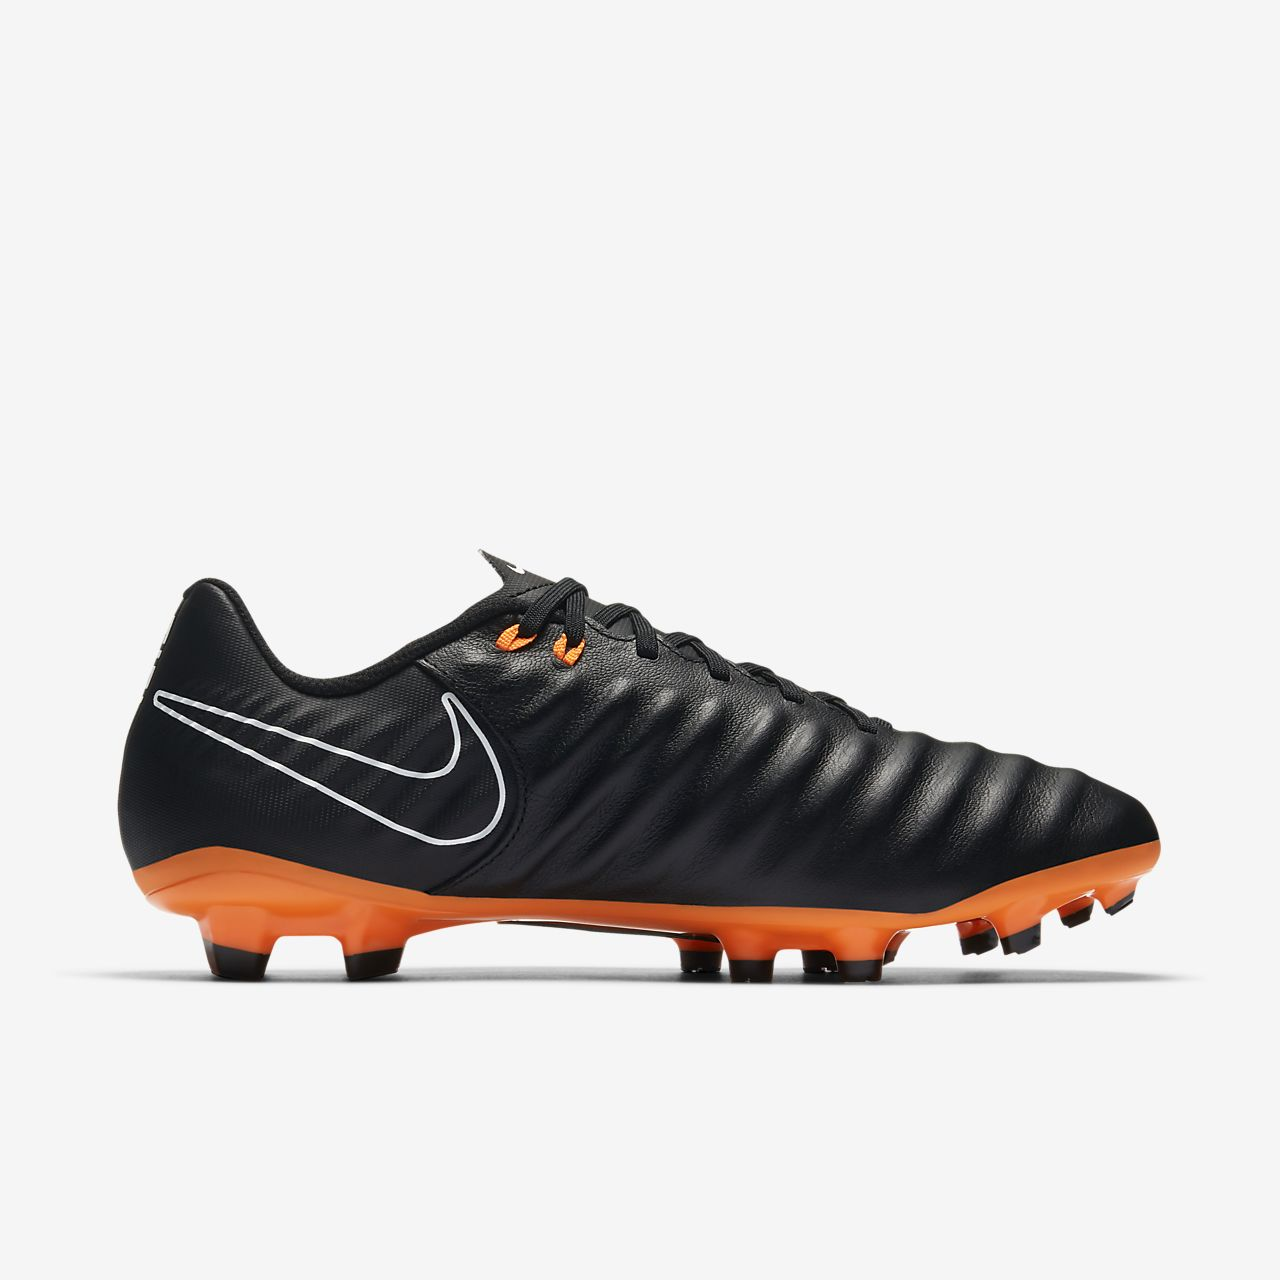 best loved a8f32 82a27 ... chaussure de football à crampons pour terrain sec nike tiempo legend  vii academy